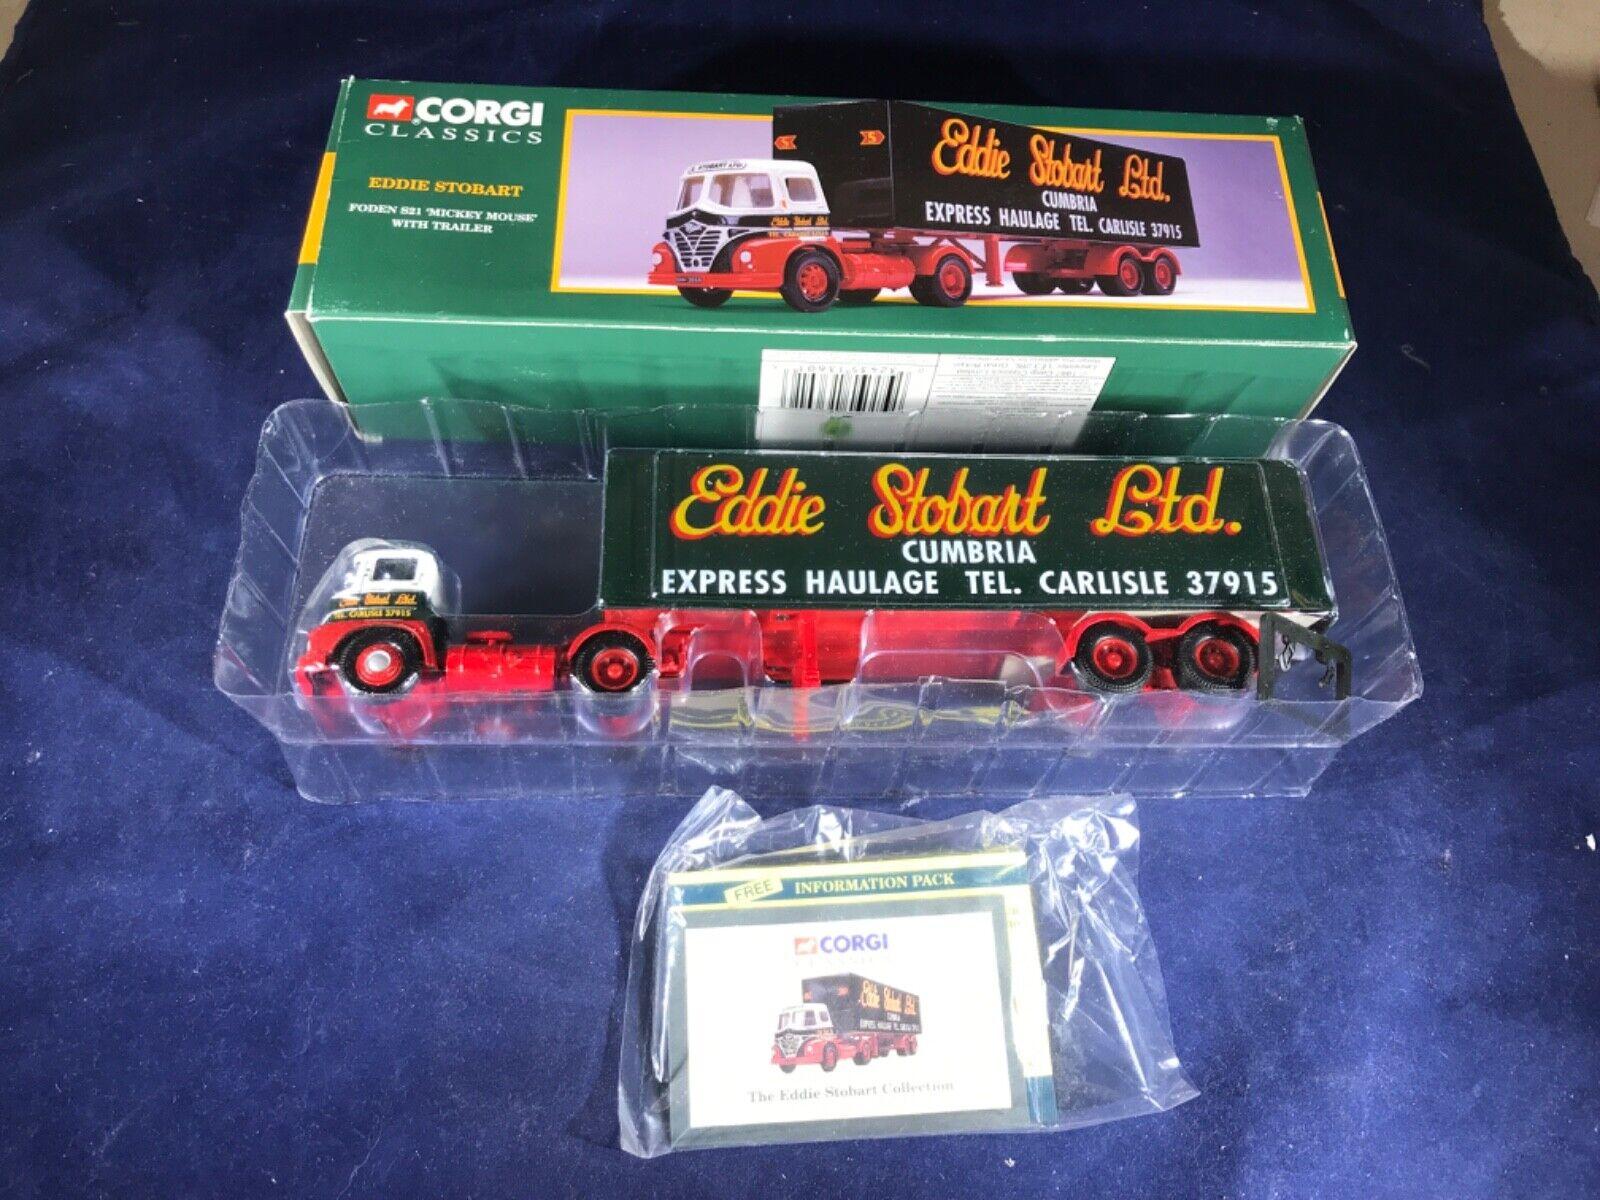 "Q-31 CORGI CLASSICS 1 50 SCALE DIE CAST TRUCK - 13601 FONDEN S21 ""MICKEY MOUSE"""